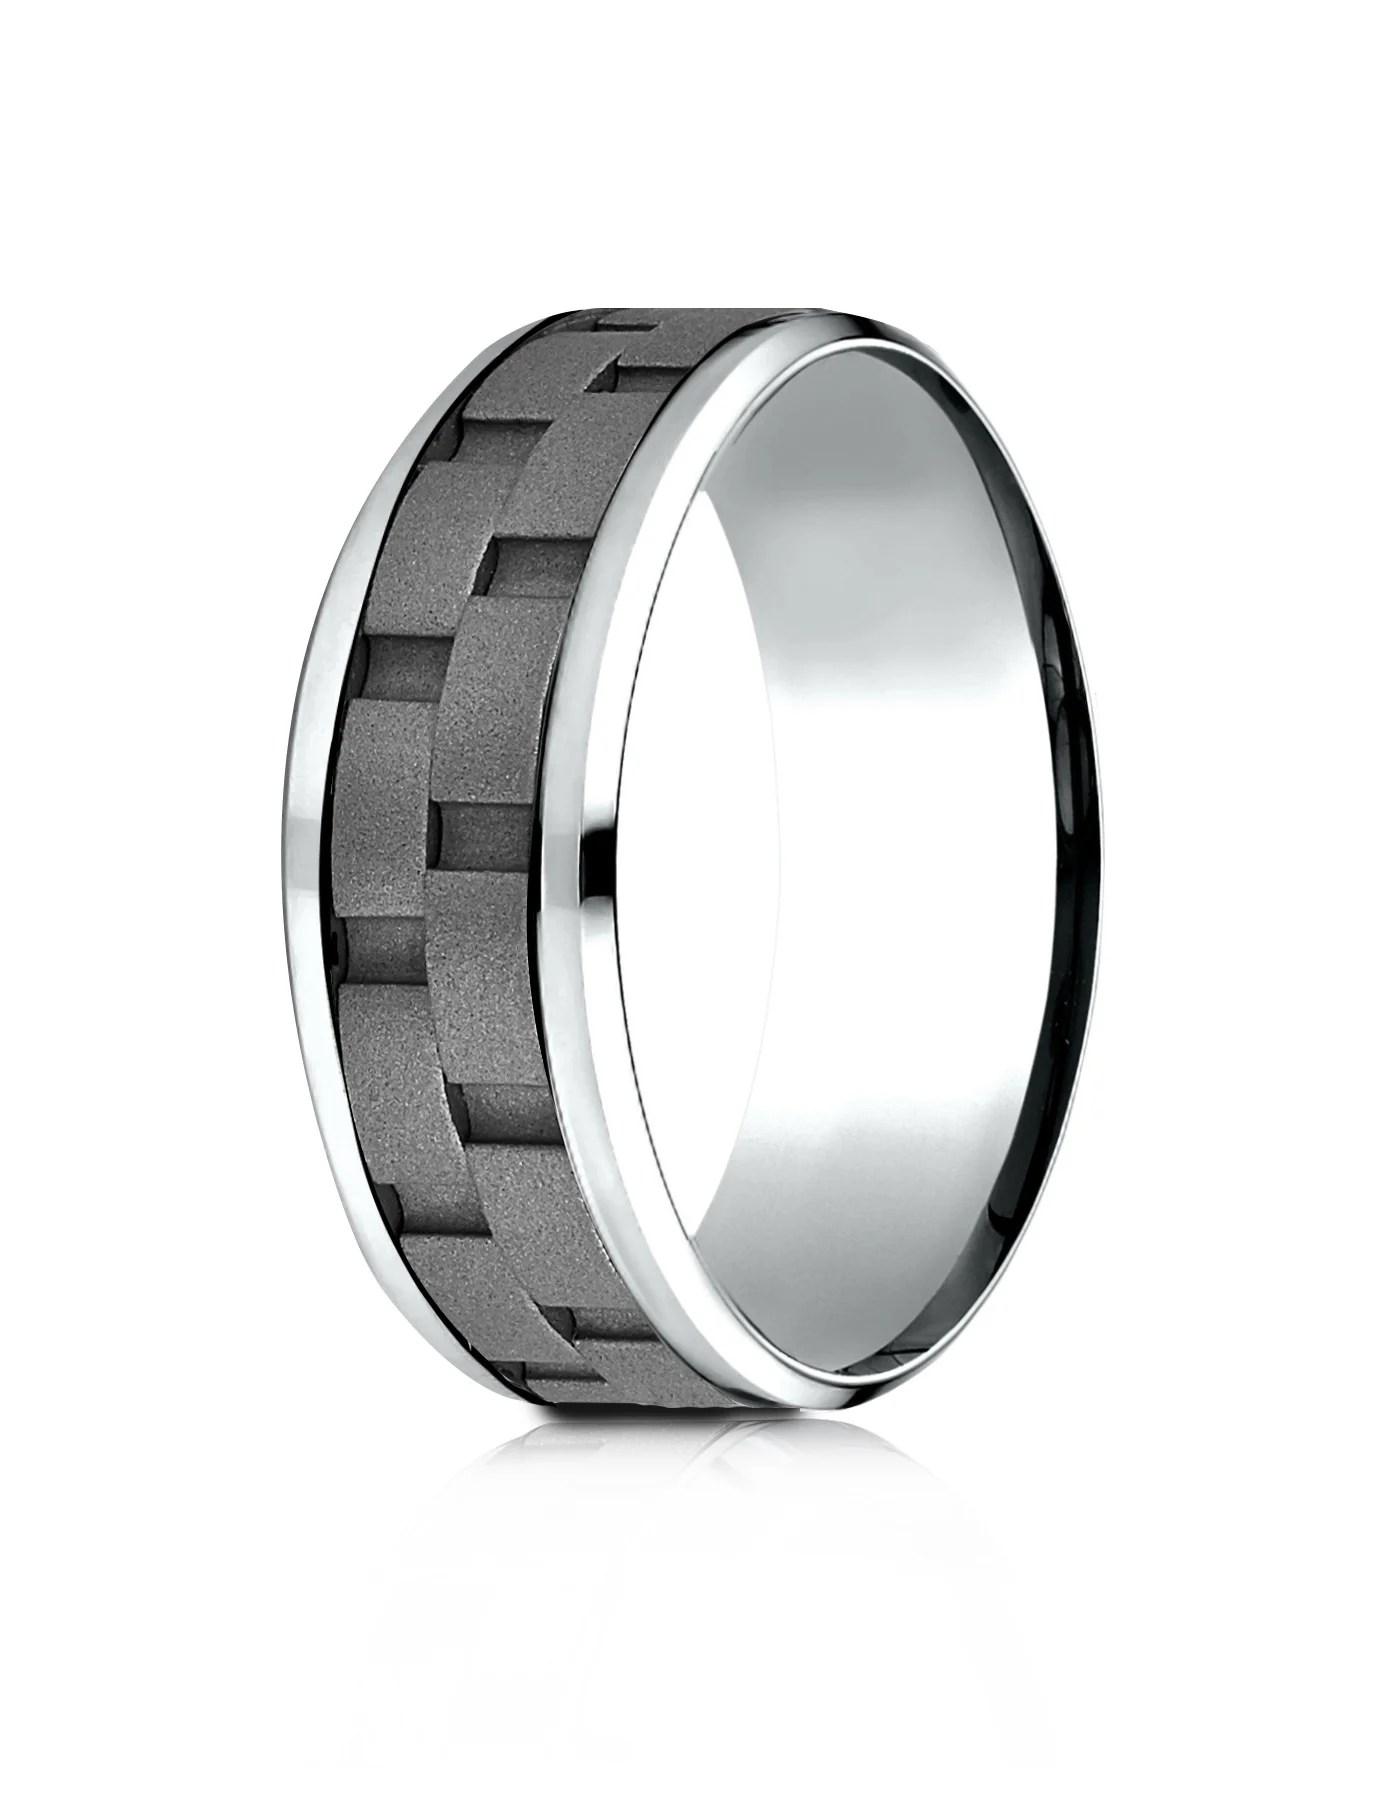 anacona cobalt sandblasted link pattern wedding band for men by benchmark cobalt wedding rings ANACONA Men s Cobalt Wedding Band Link Pattern by Benchmark